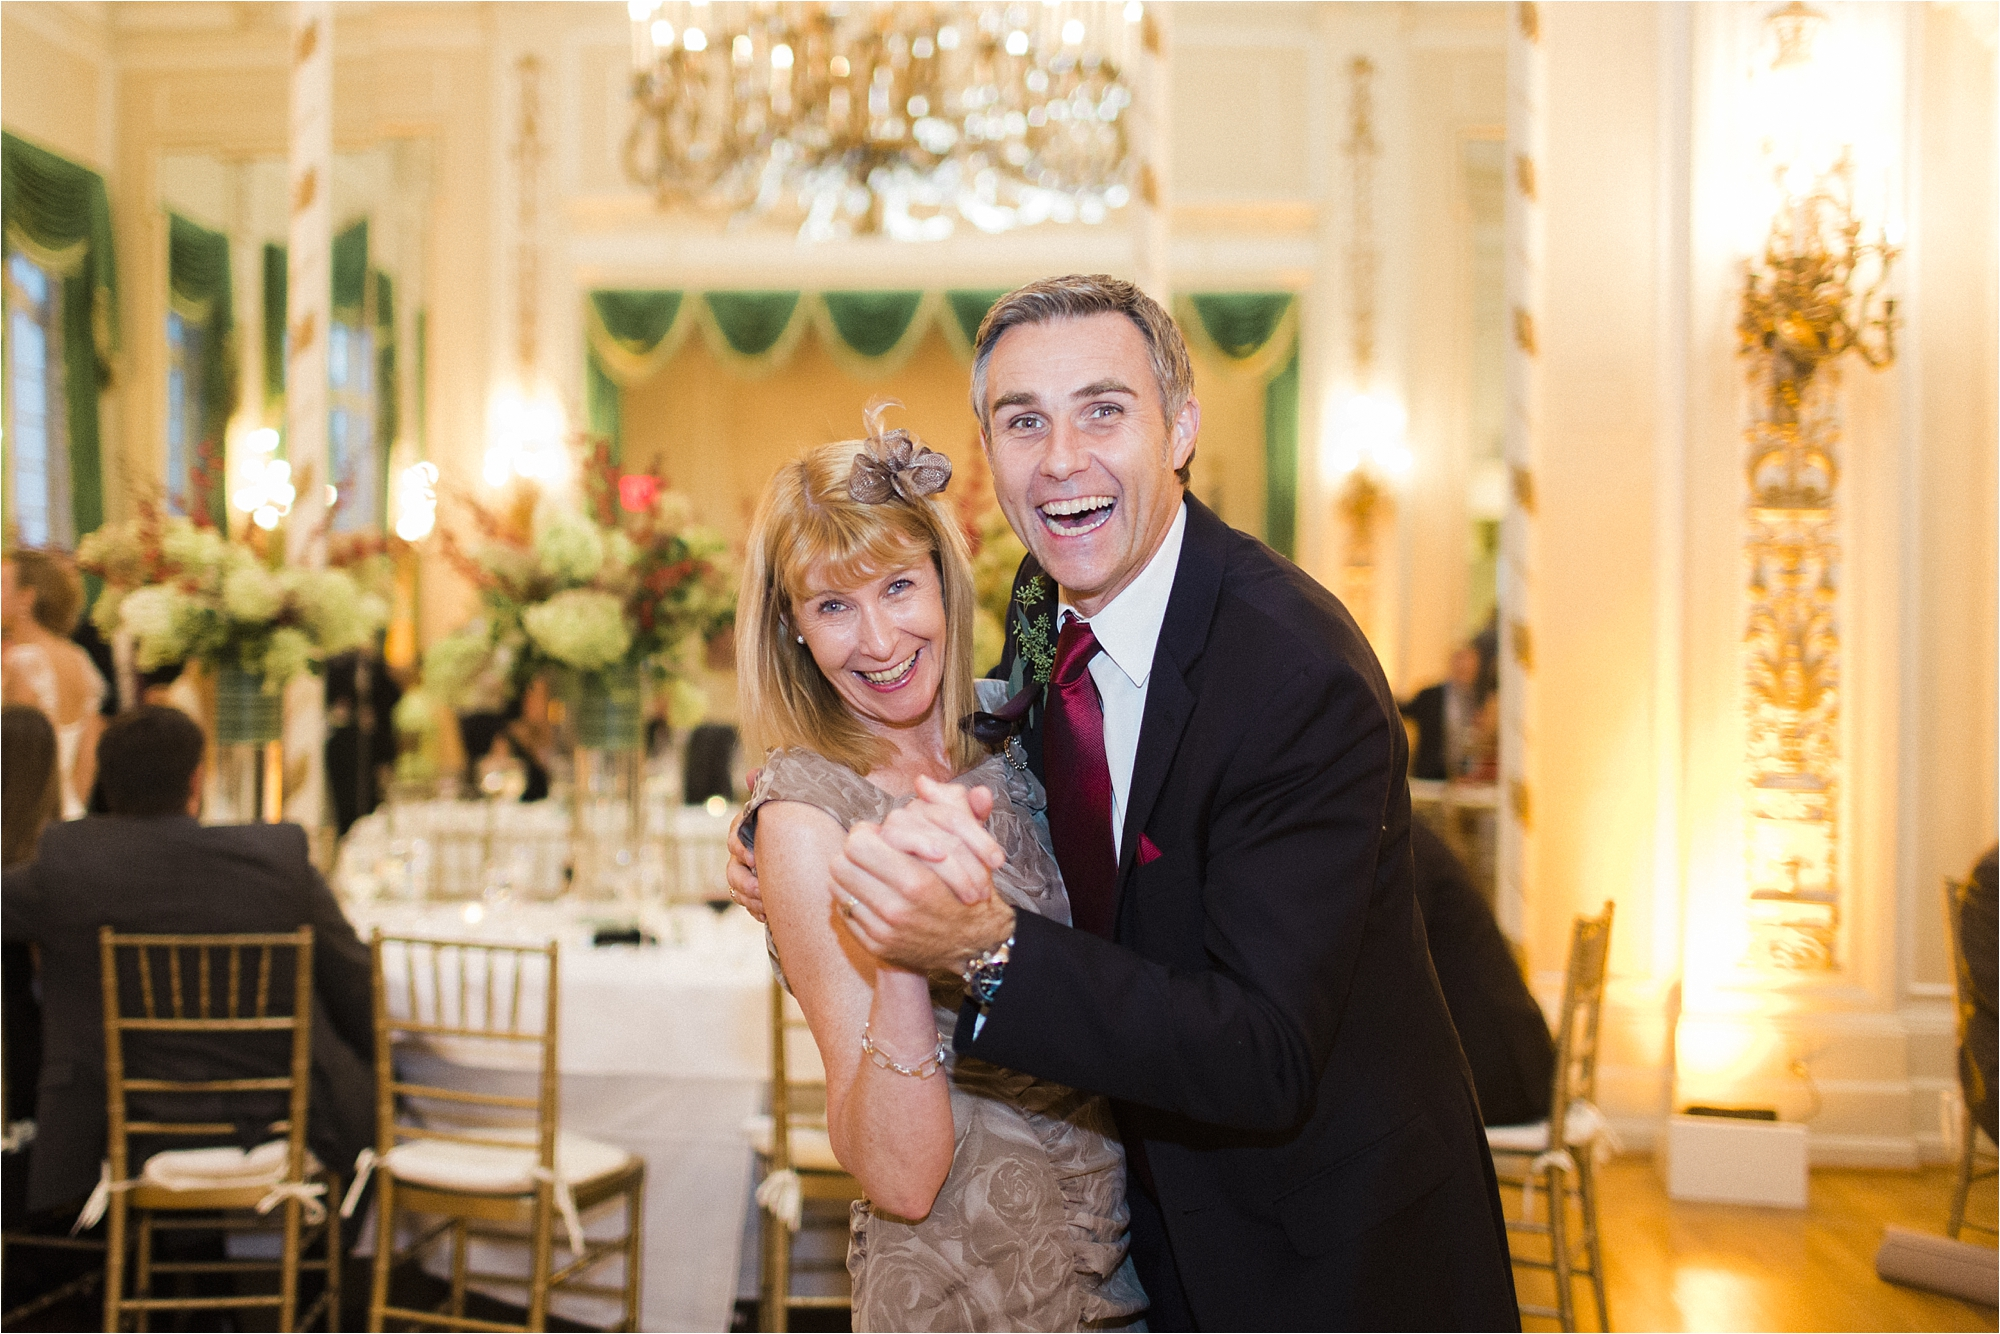 stephanie-yonce-photography-elegant-private-club-washington-dc-wedding-photos_0053.jpg